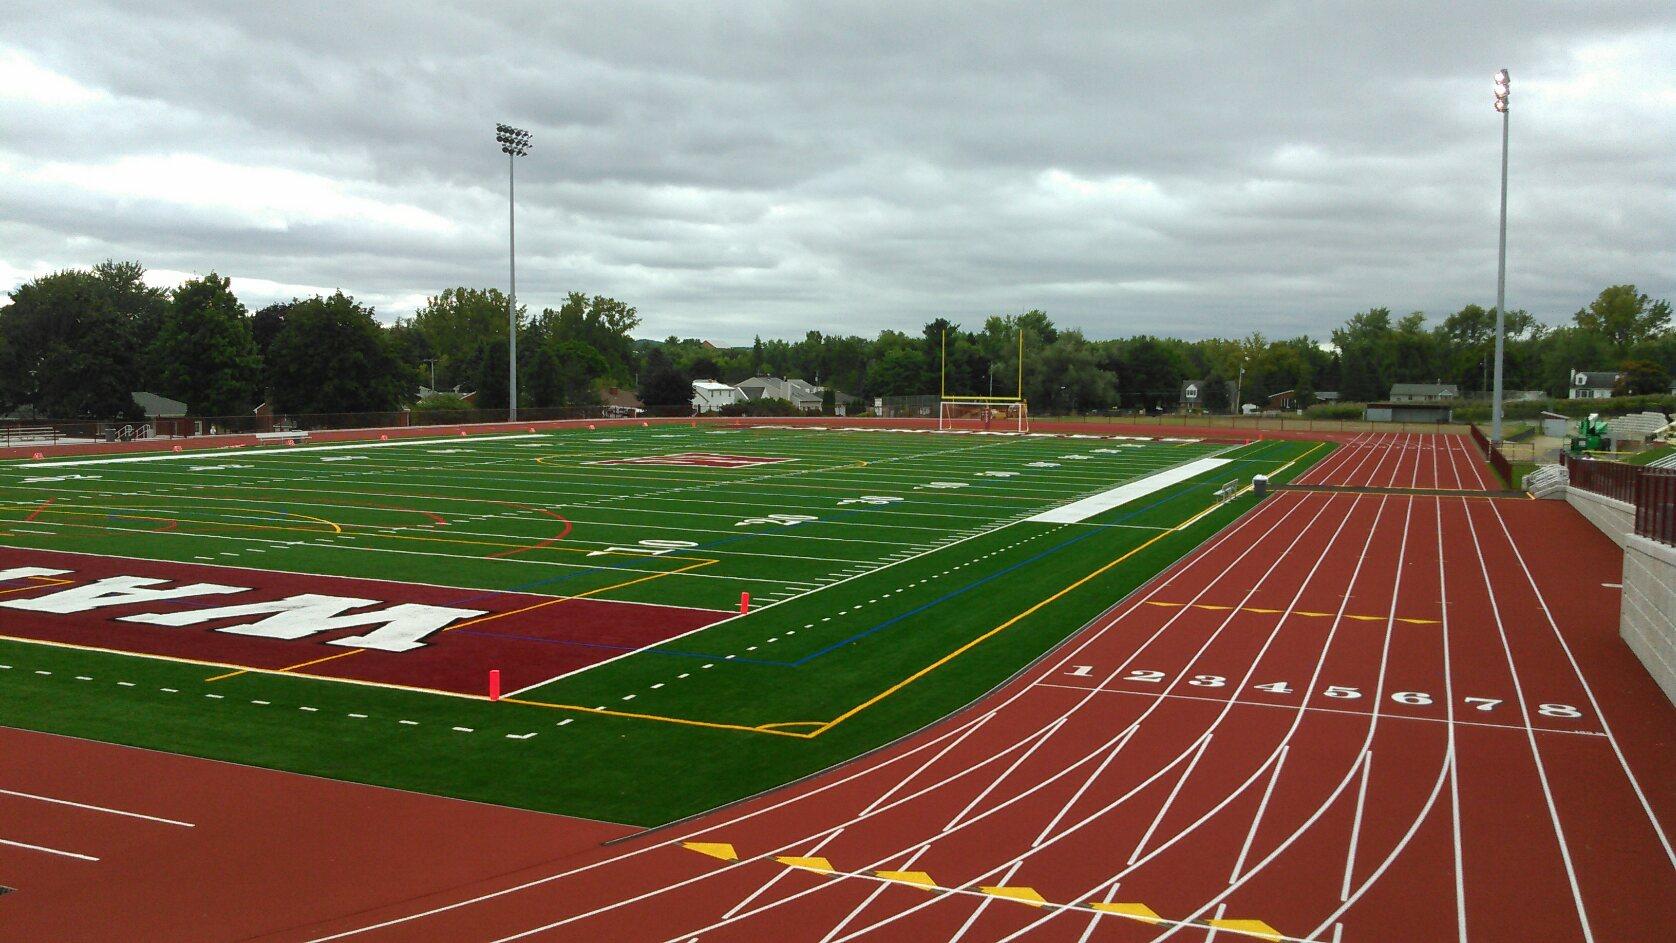 Athletic Field And Stadiumwatervliet Ny Weston Amp Sampson